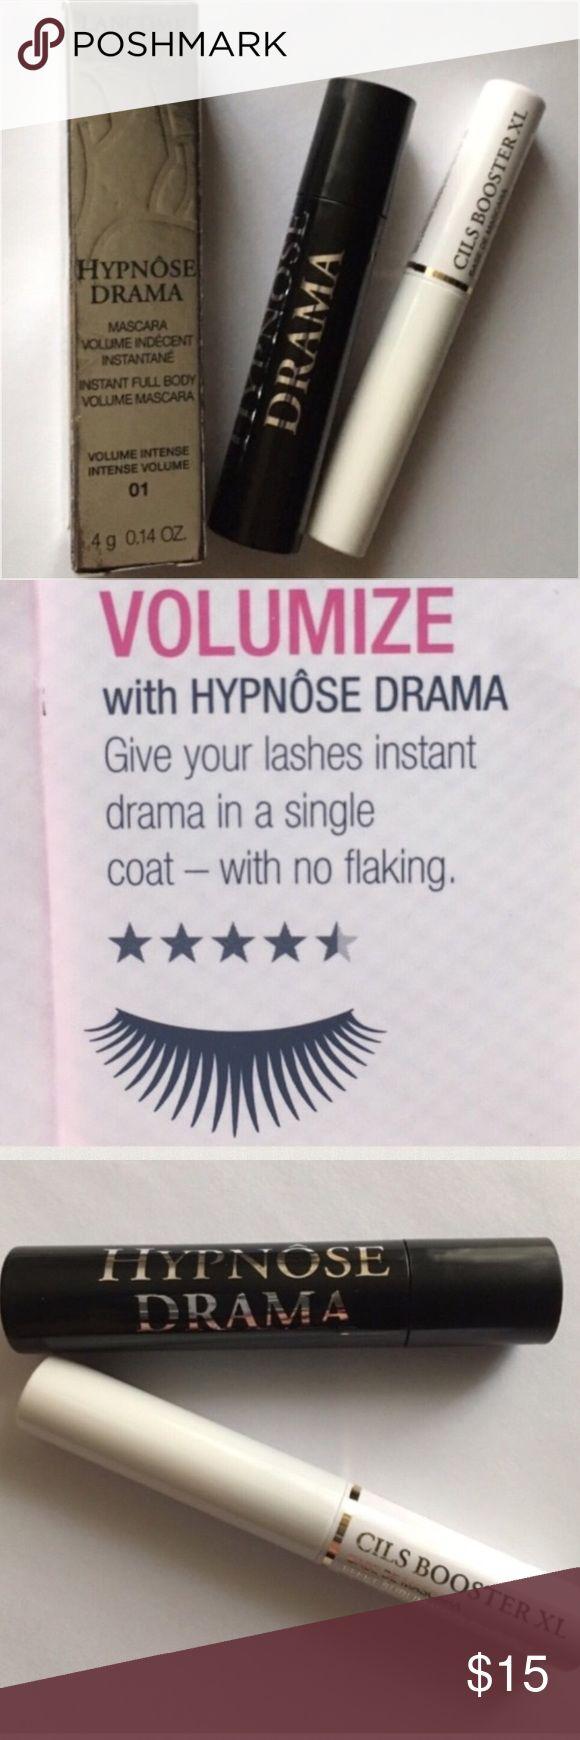 🆕🔥NEW🔥Lancôme Hypnose Drama Mascara & Cils Base 🆕🔥NEW🔥Lancôme Hypnose Drama Mascara in Excessive Black & Lancôme Cils Booster XL Mascara Base. Both Travel Size. BNIB! BRAND NEW! UNTOUCHED! 🚫Trades🚫Price Firm Unless Bundled Sephora Makeup Mascara